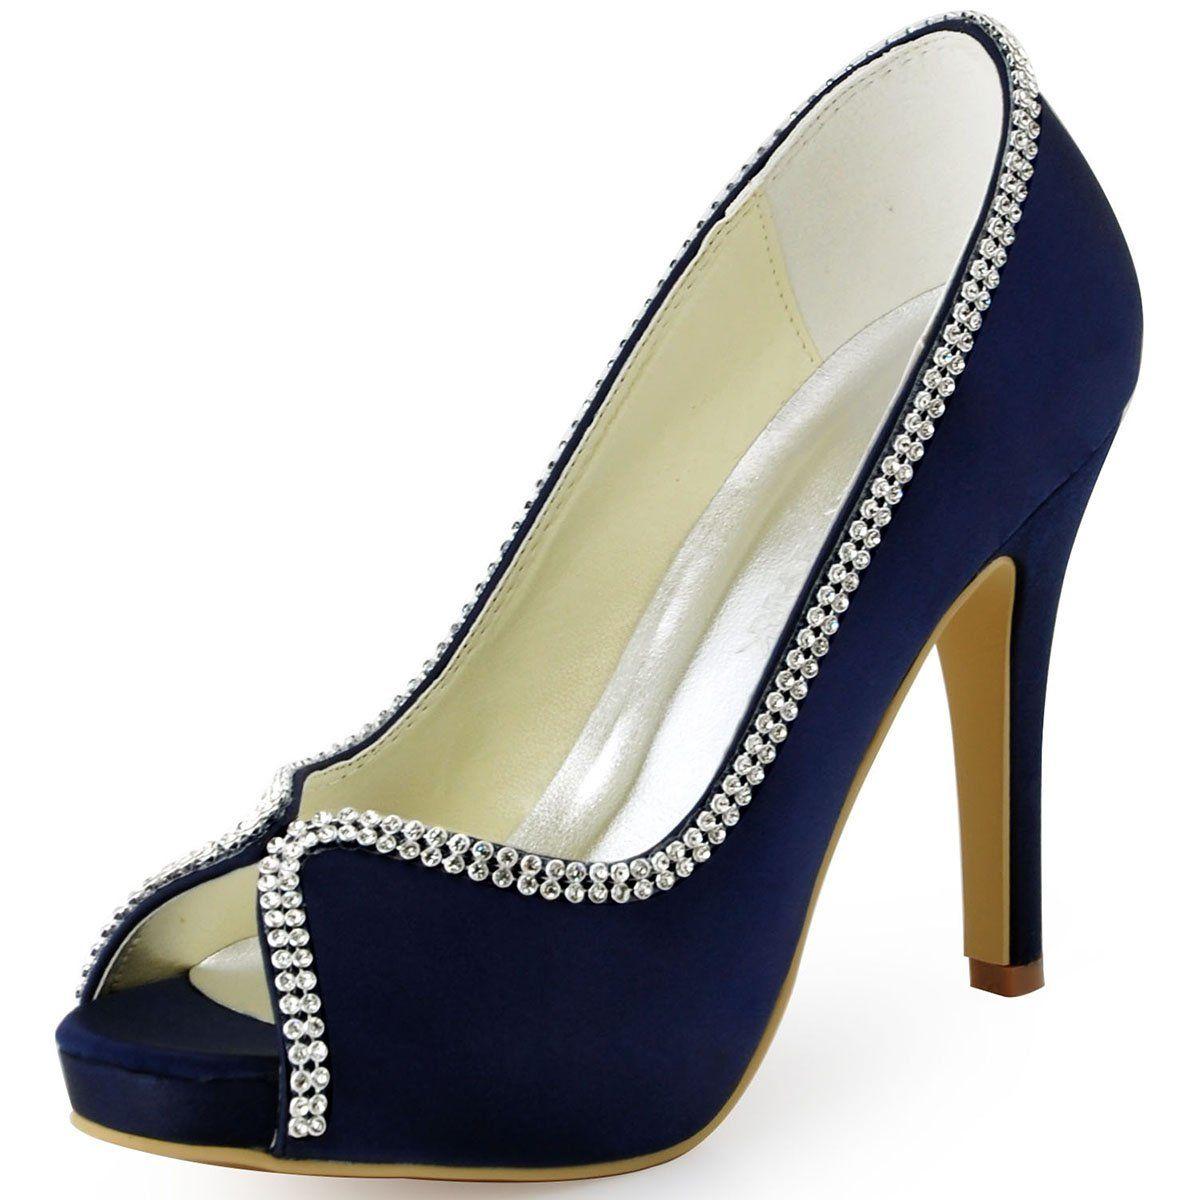 ElegantPark EP11083 Women s Evening Prom Platform Satin Prom High Heel  Wedding Bridal Shoes Navy Blue US 6 45930a0e4508